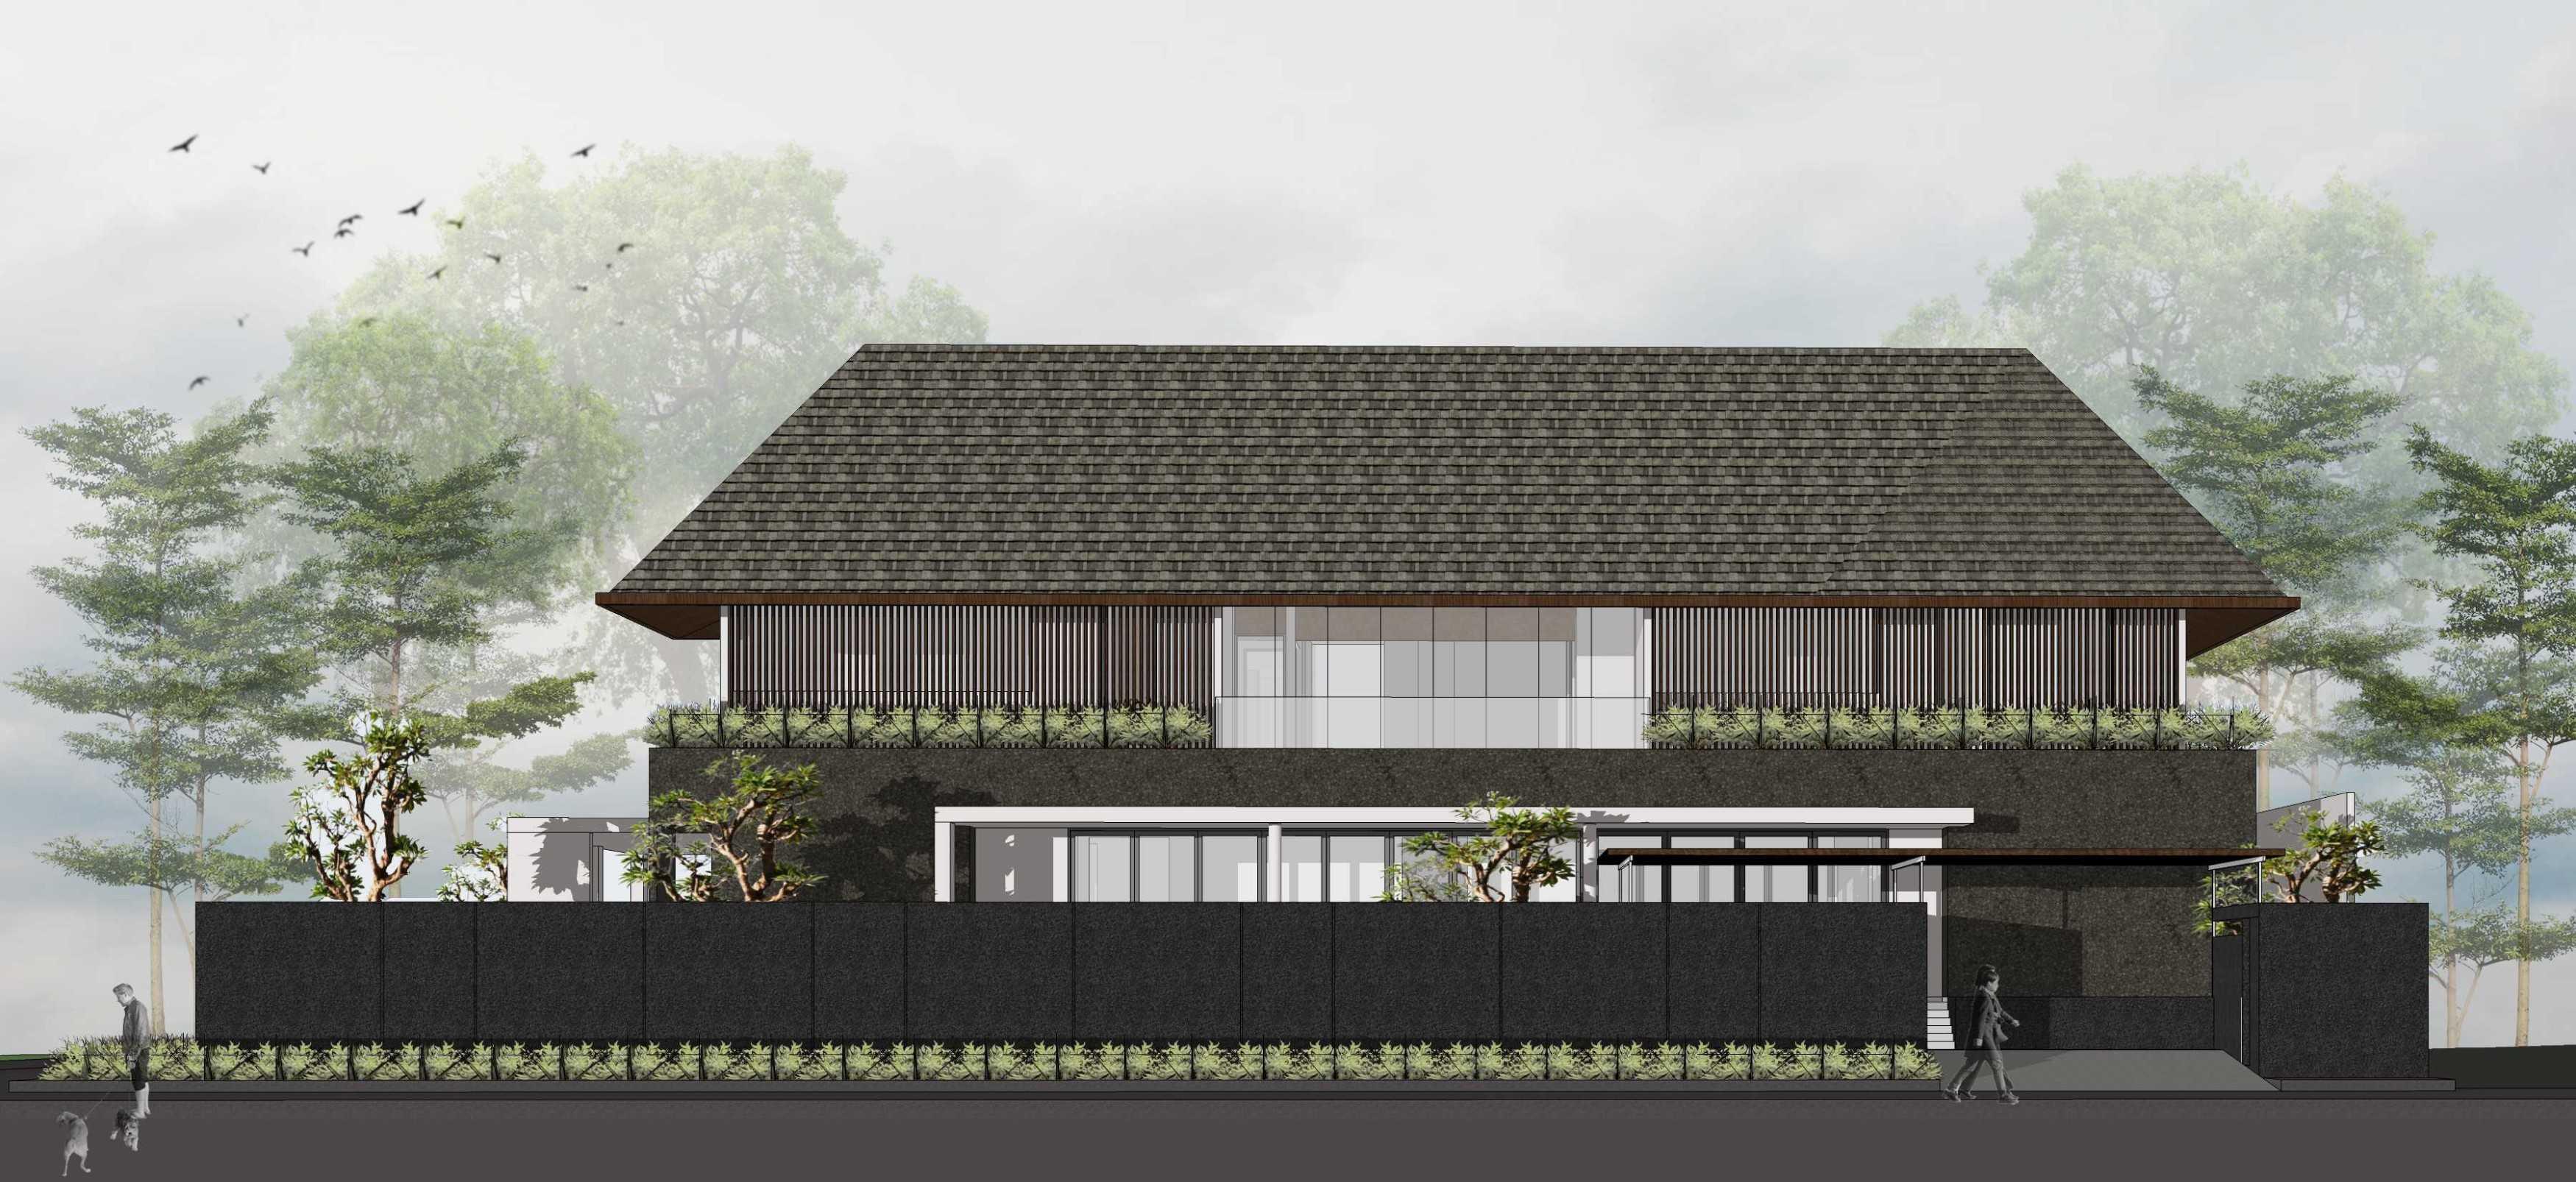 Pt. Modula Intercon House Jakarta, Daerah Khusus Ibukota Jakarta, Indonesia Jakarta, Daerah Khusus Ibukota Jakarta, Indonesia Pt-Modula-Intercon-House   57791